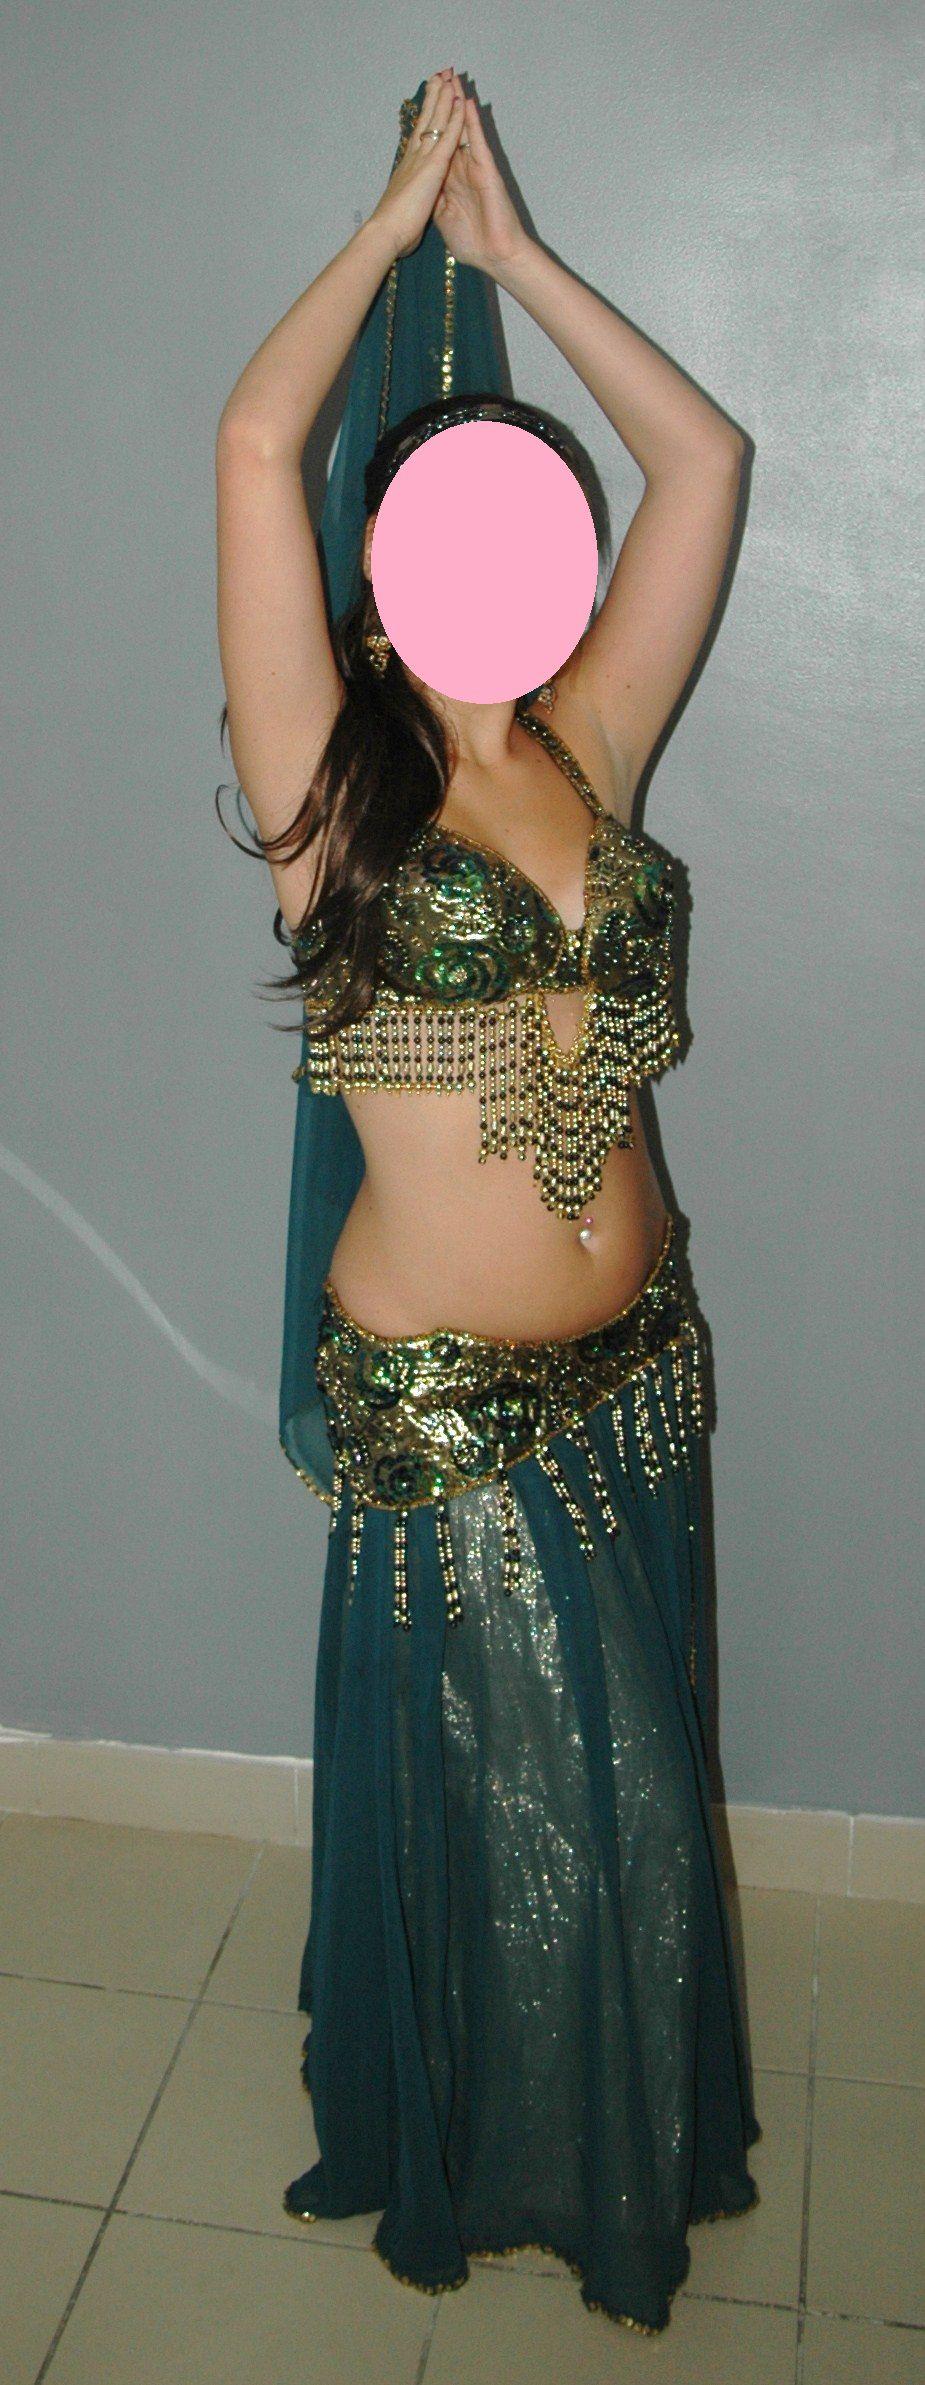 da88bc9a11bfc3 Costume danse orientale Vert / Mordoré + voile perlé assorti - Iman ...